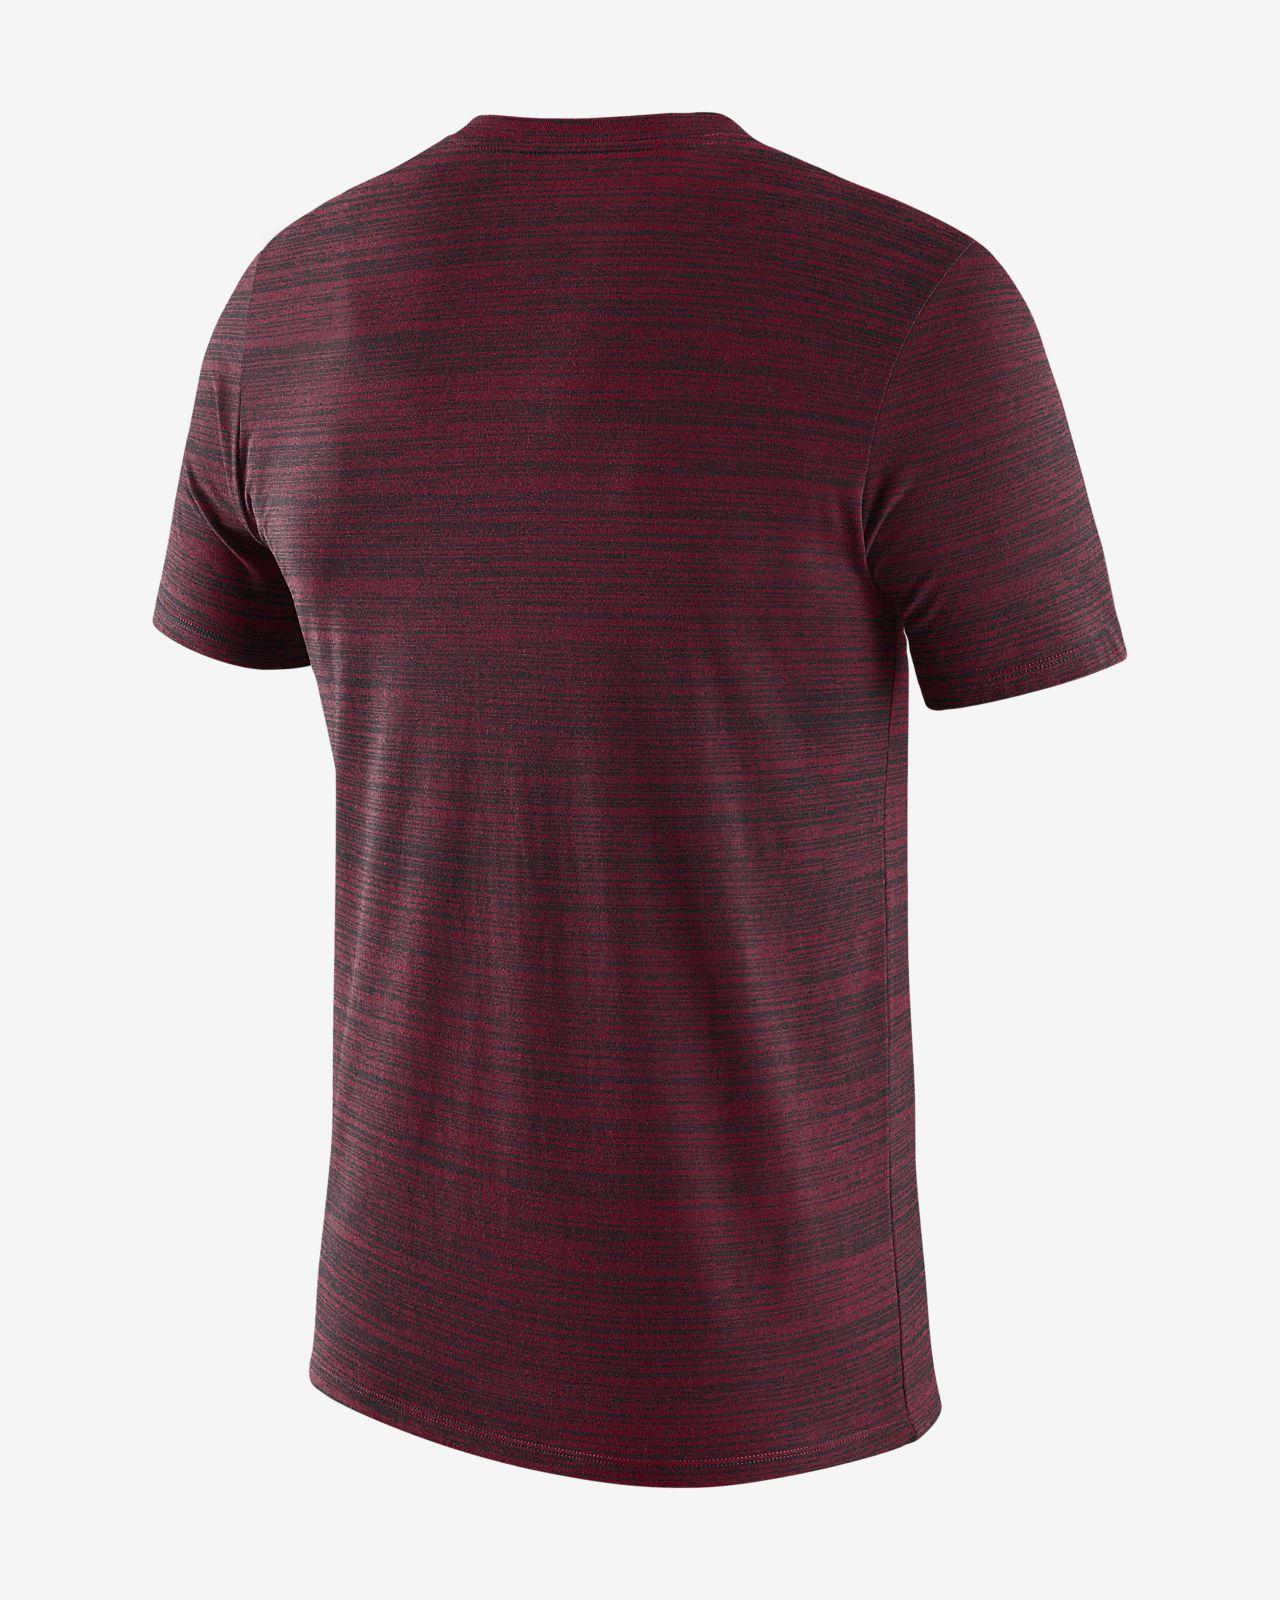 0b235ff8426fe1 Jordan College Dri-FIT Legend Velocity (Oklahoma) Men s T-Shirt ...